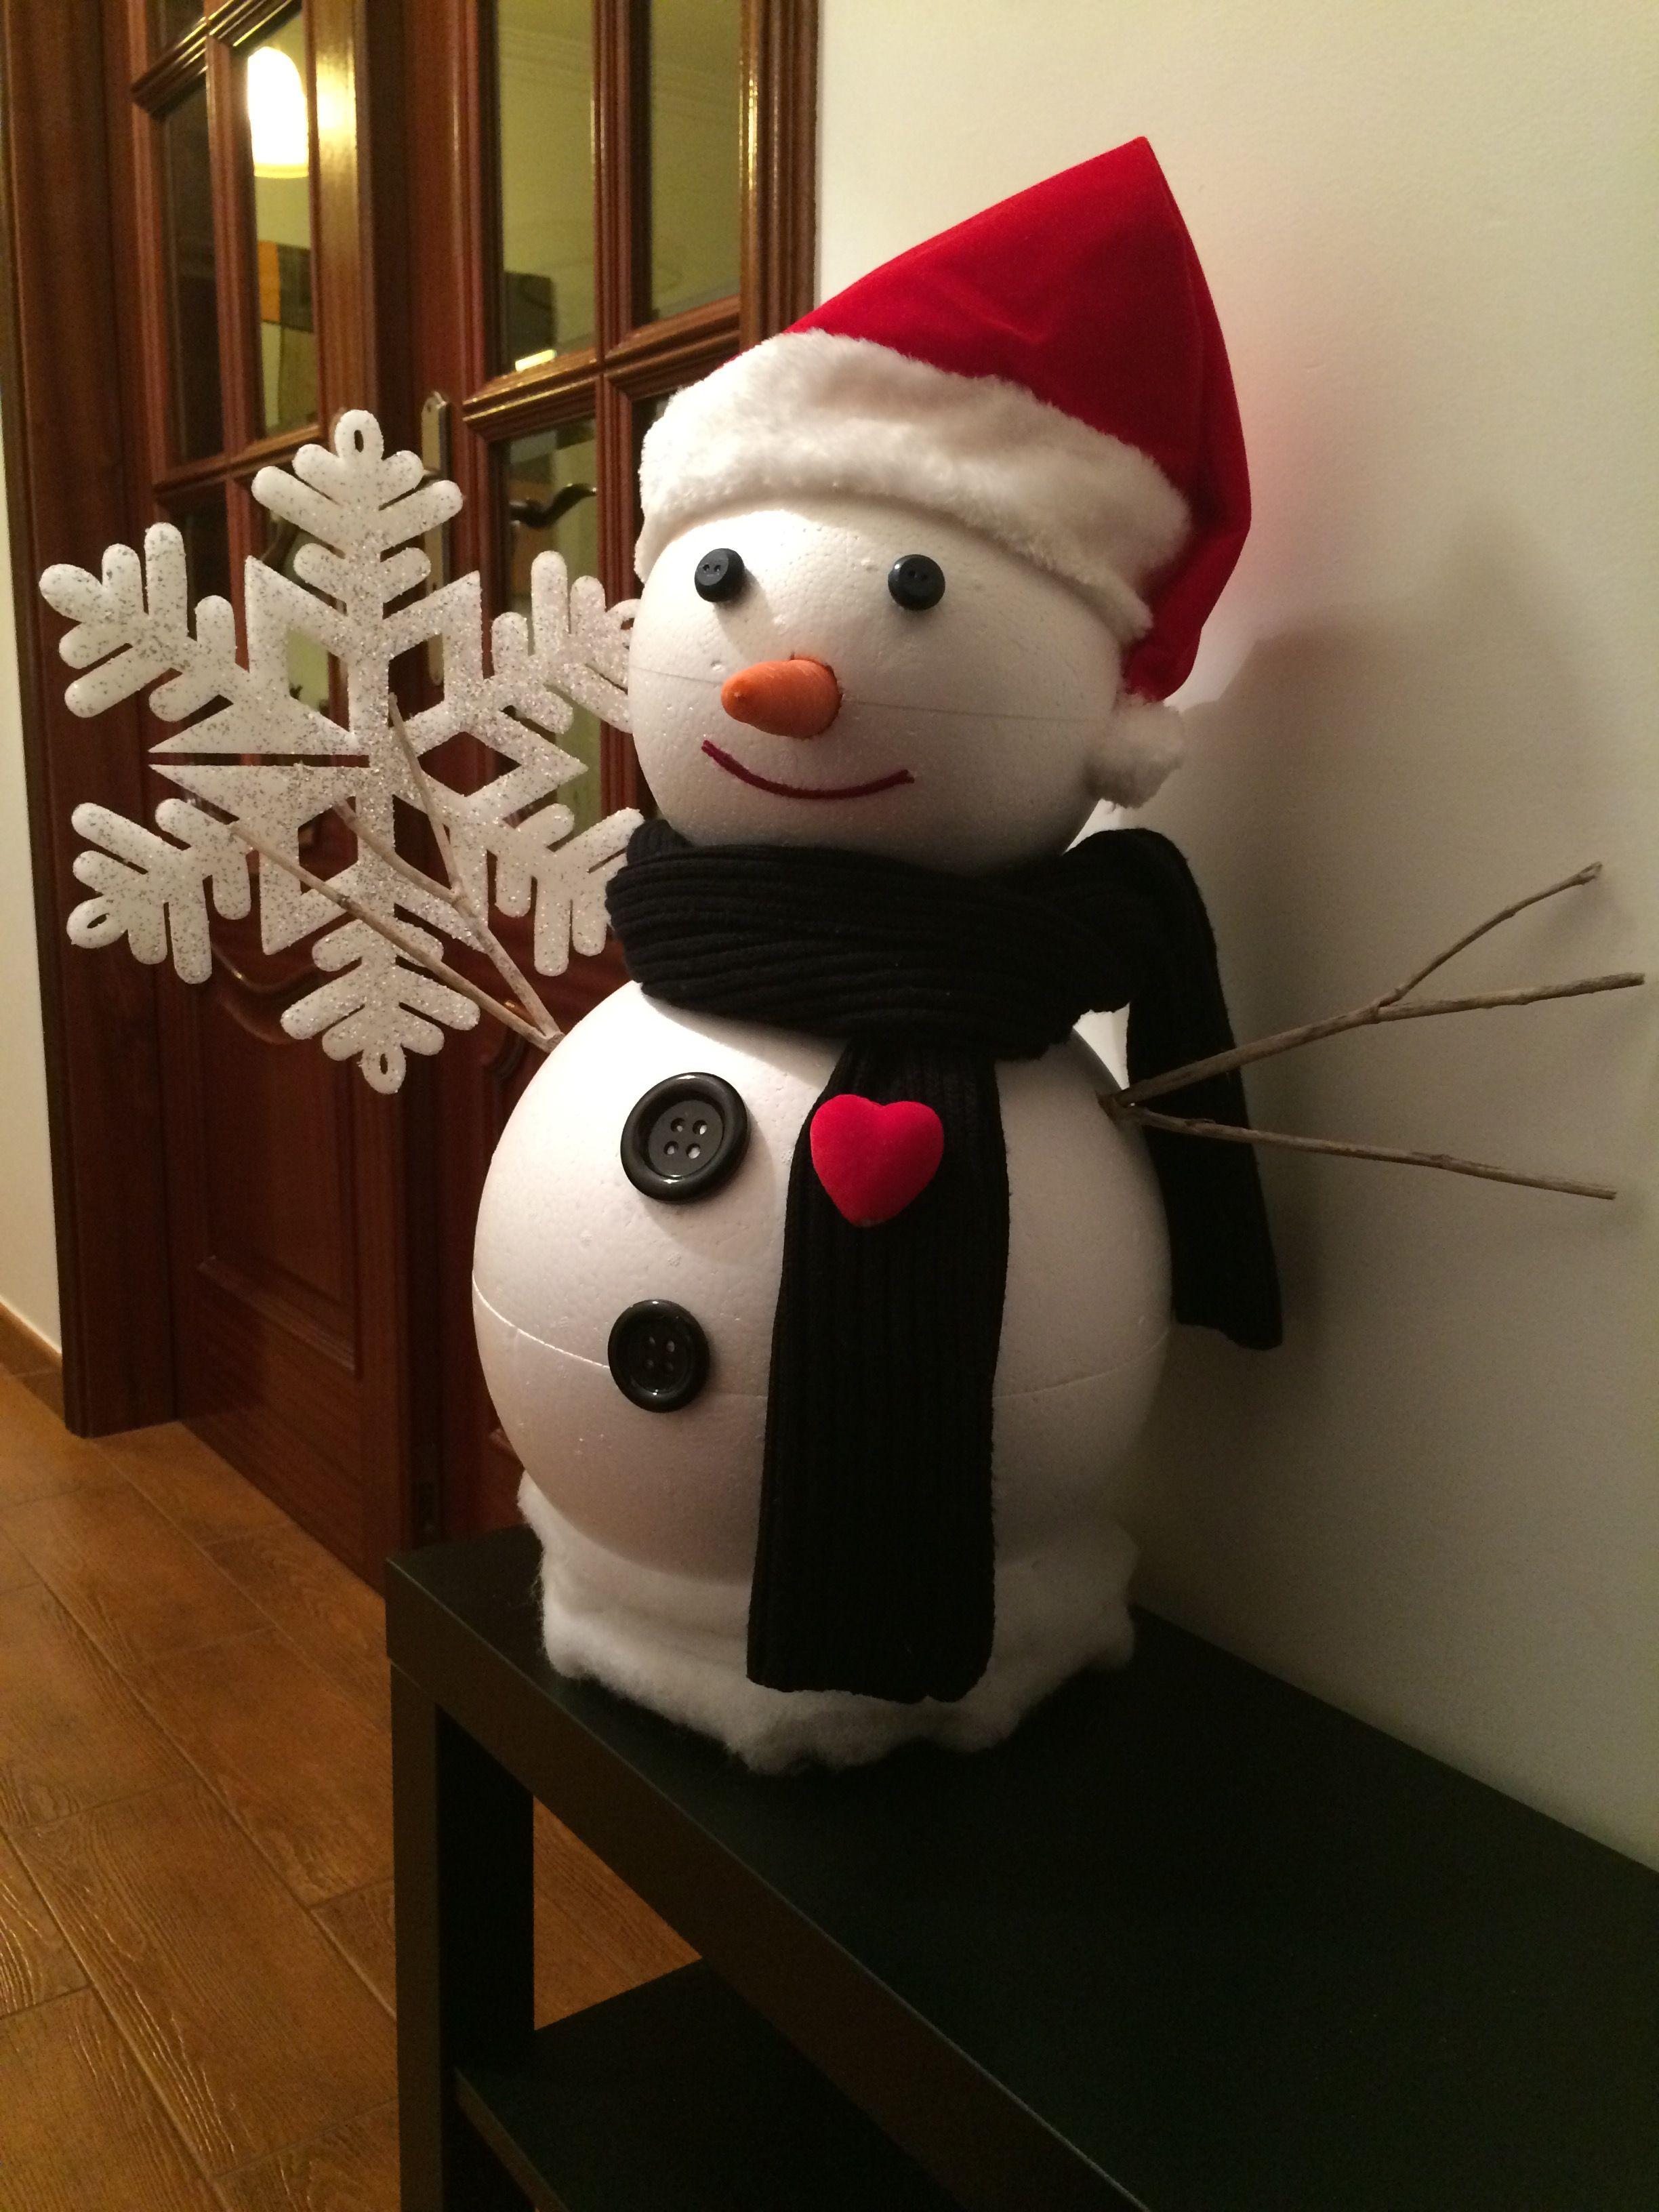 Boneco de Neve# Snowman#